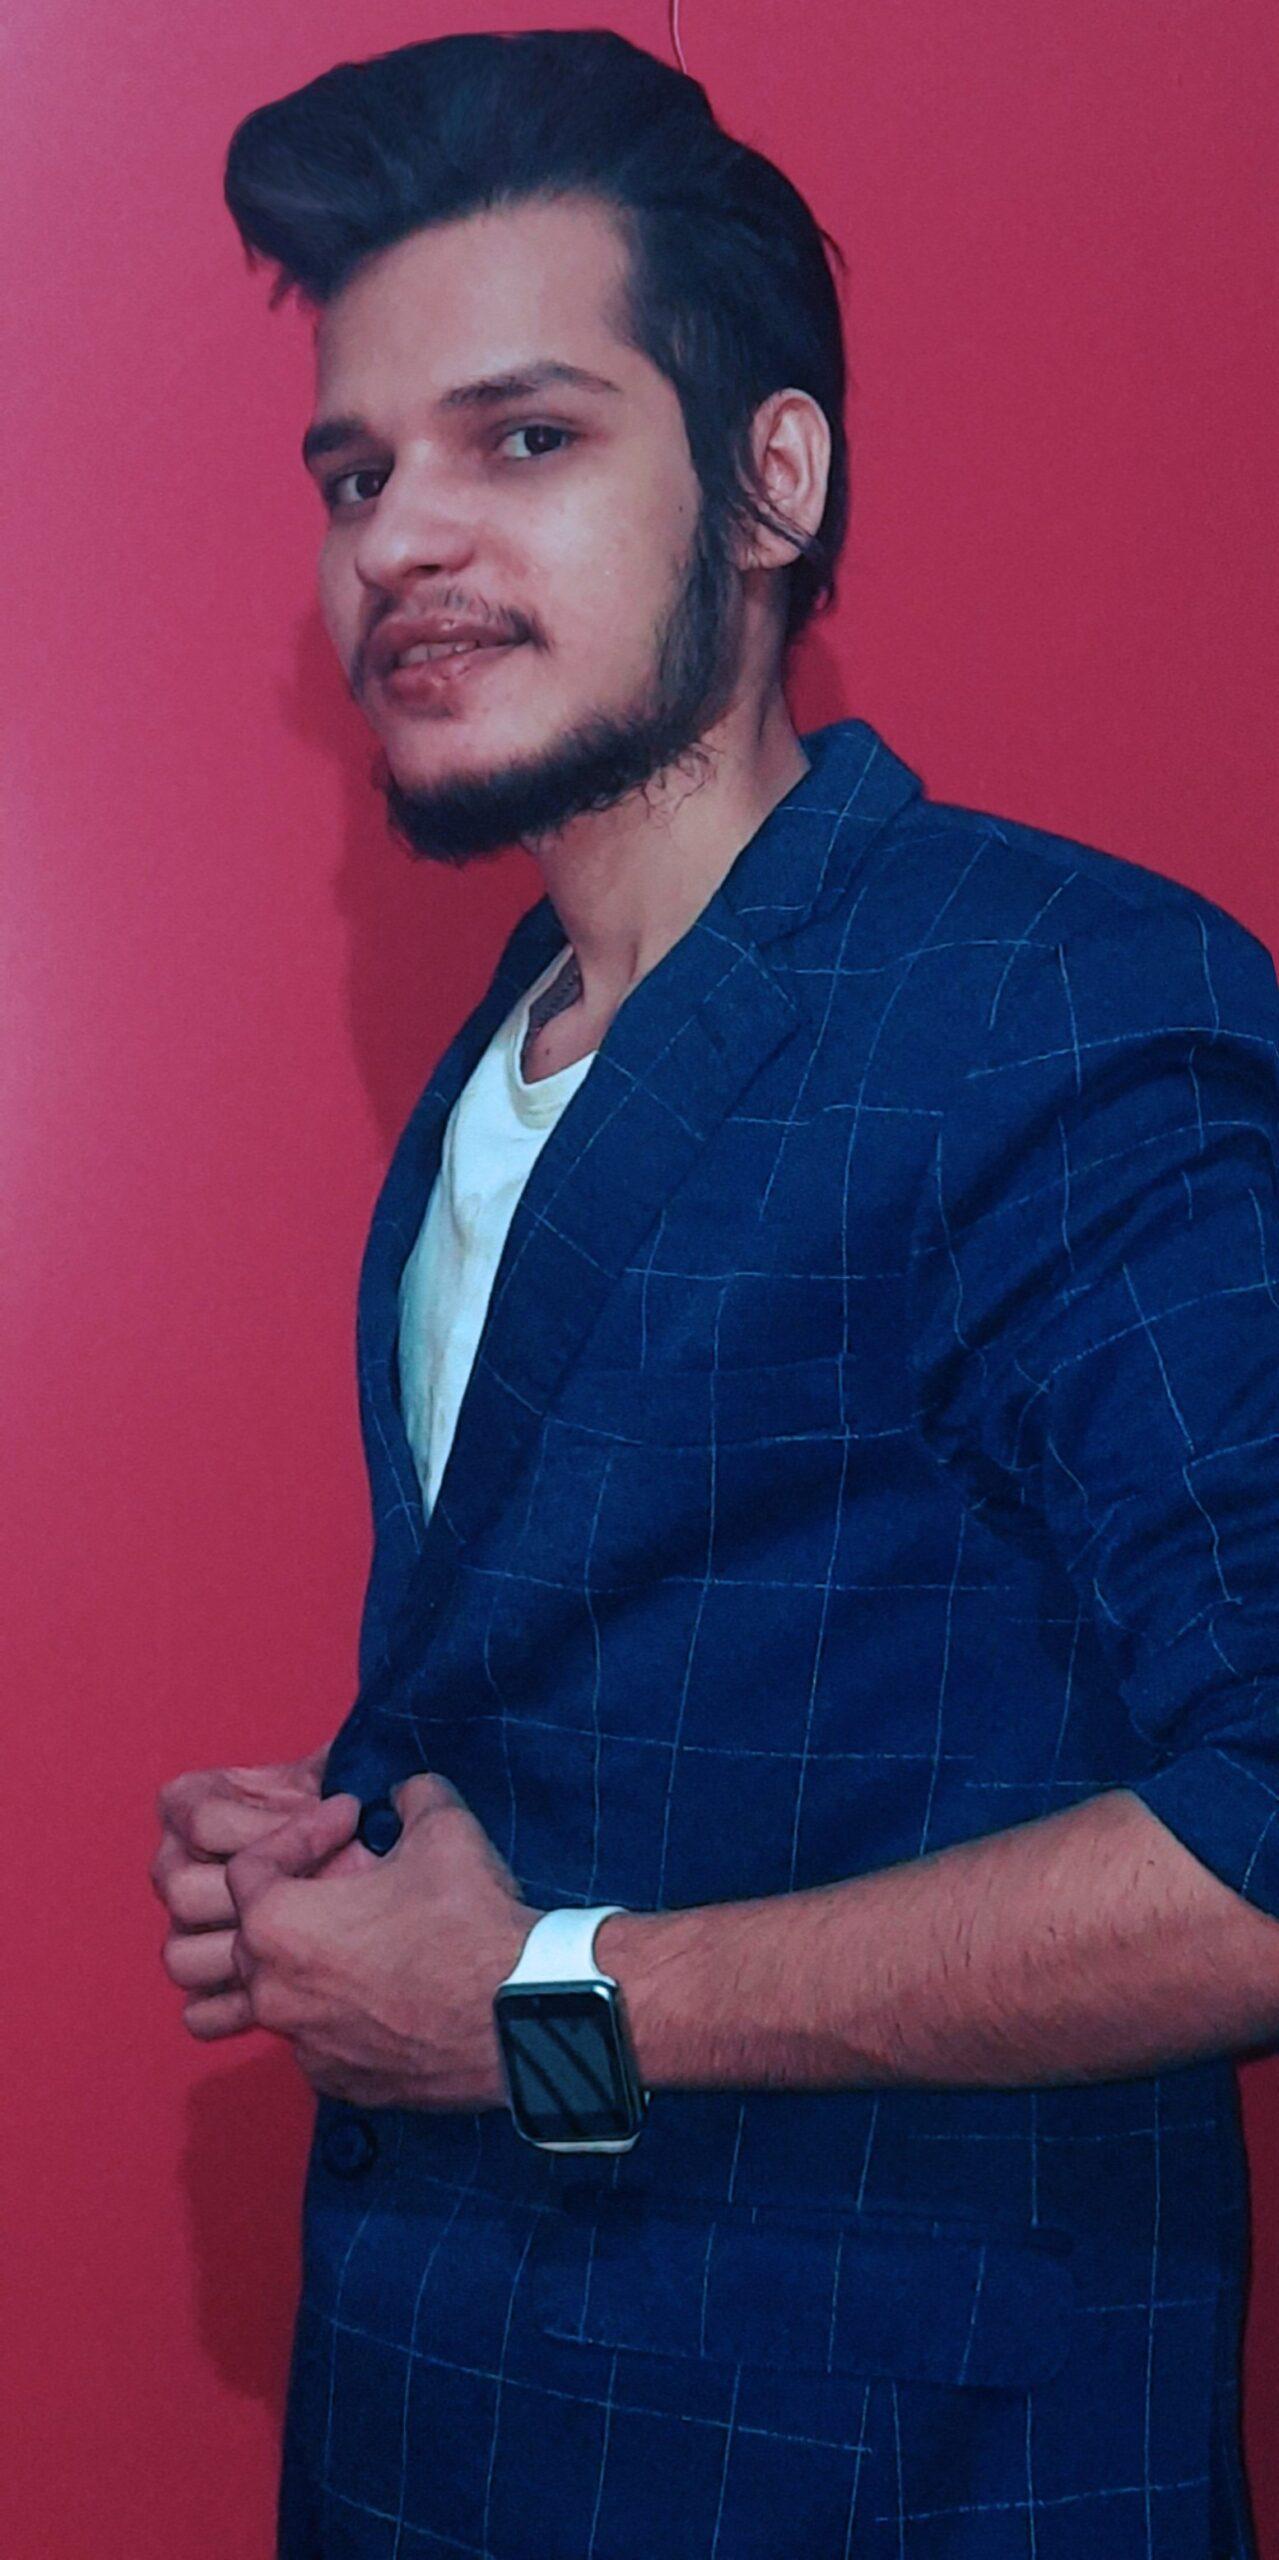 Abhinav Ojha - The passionate entreprenuer